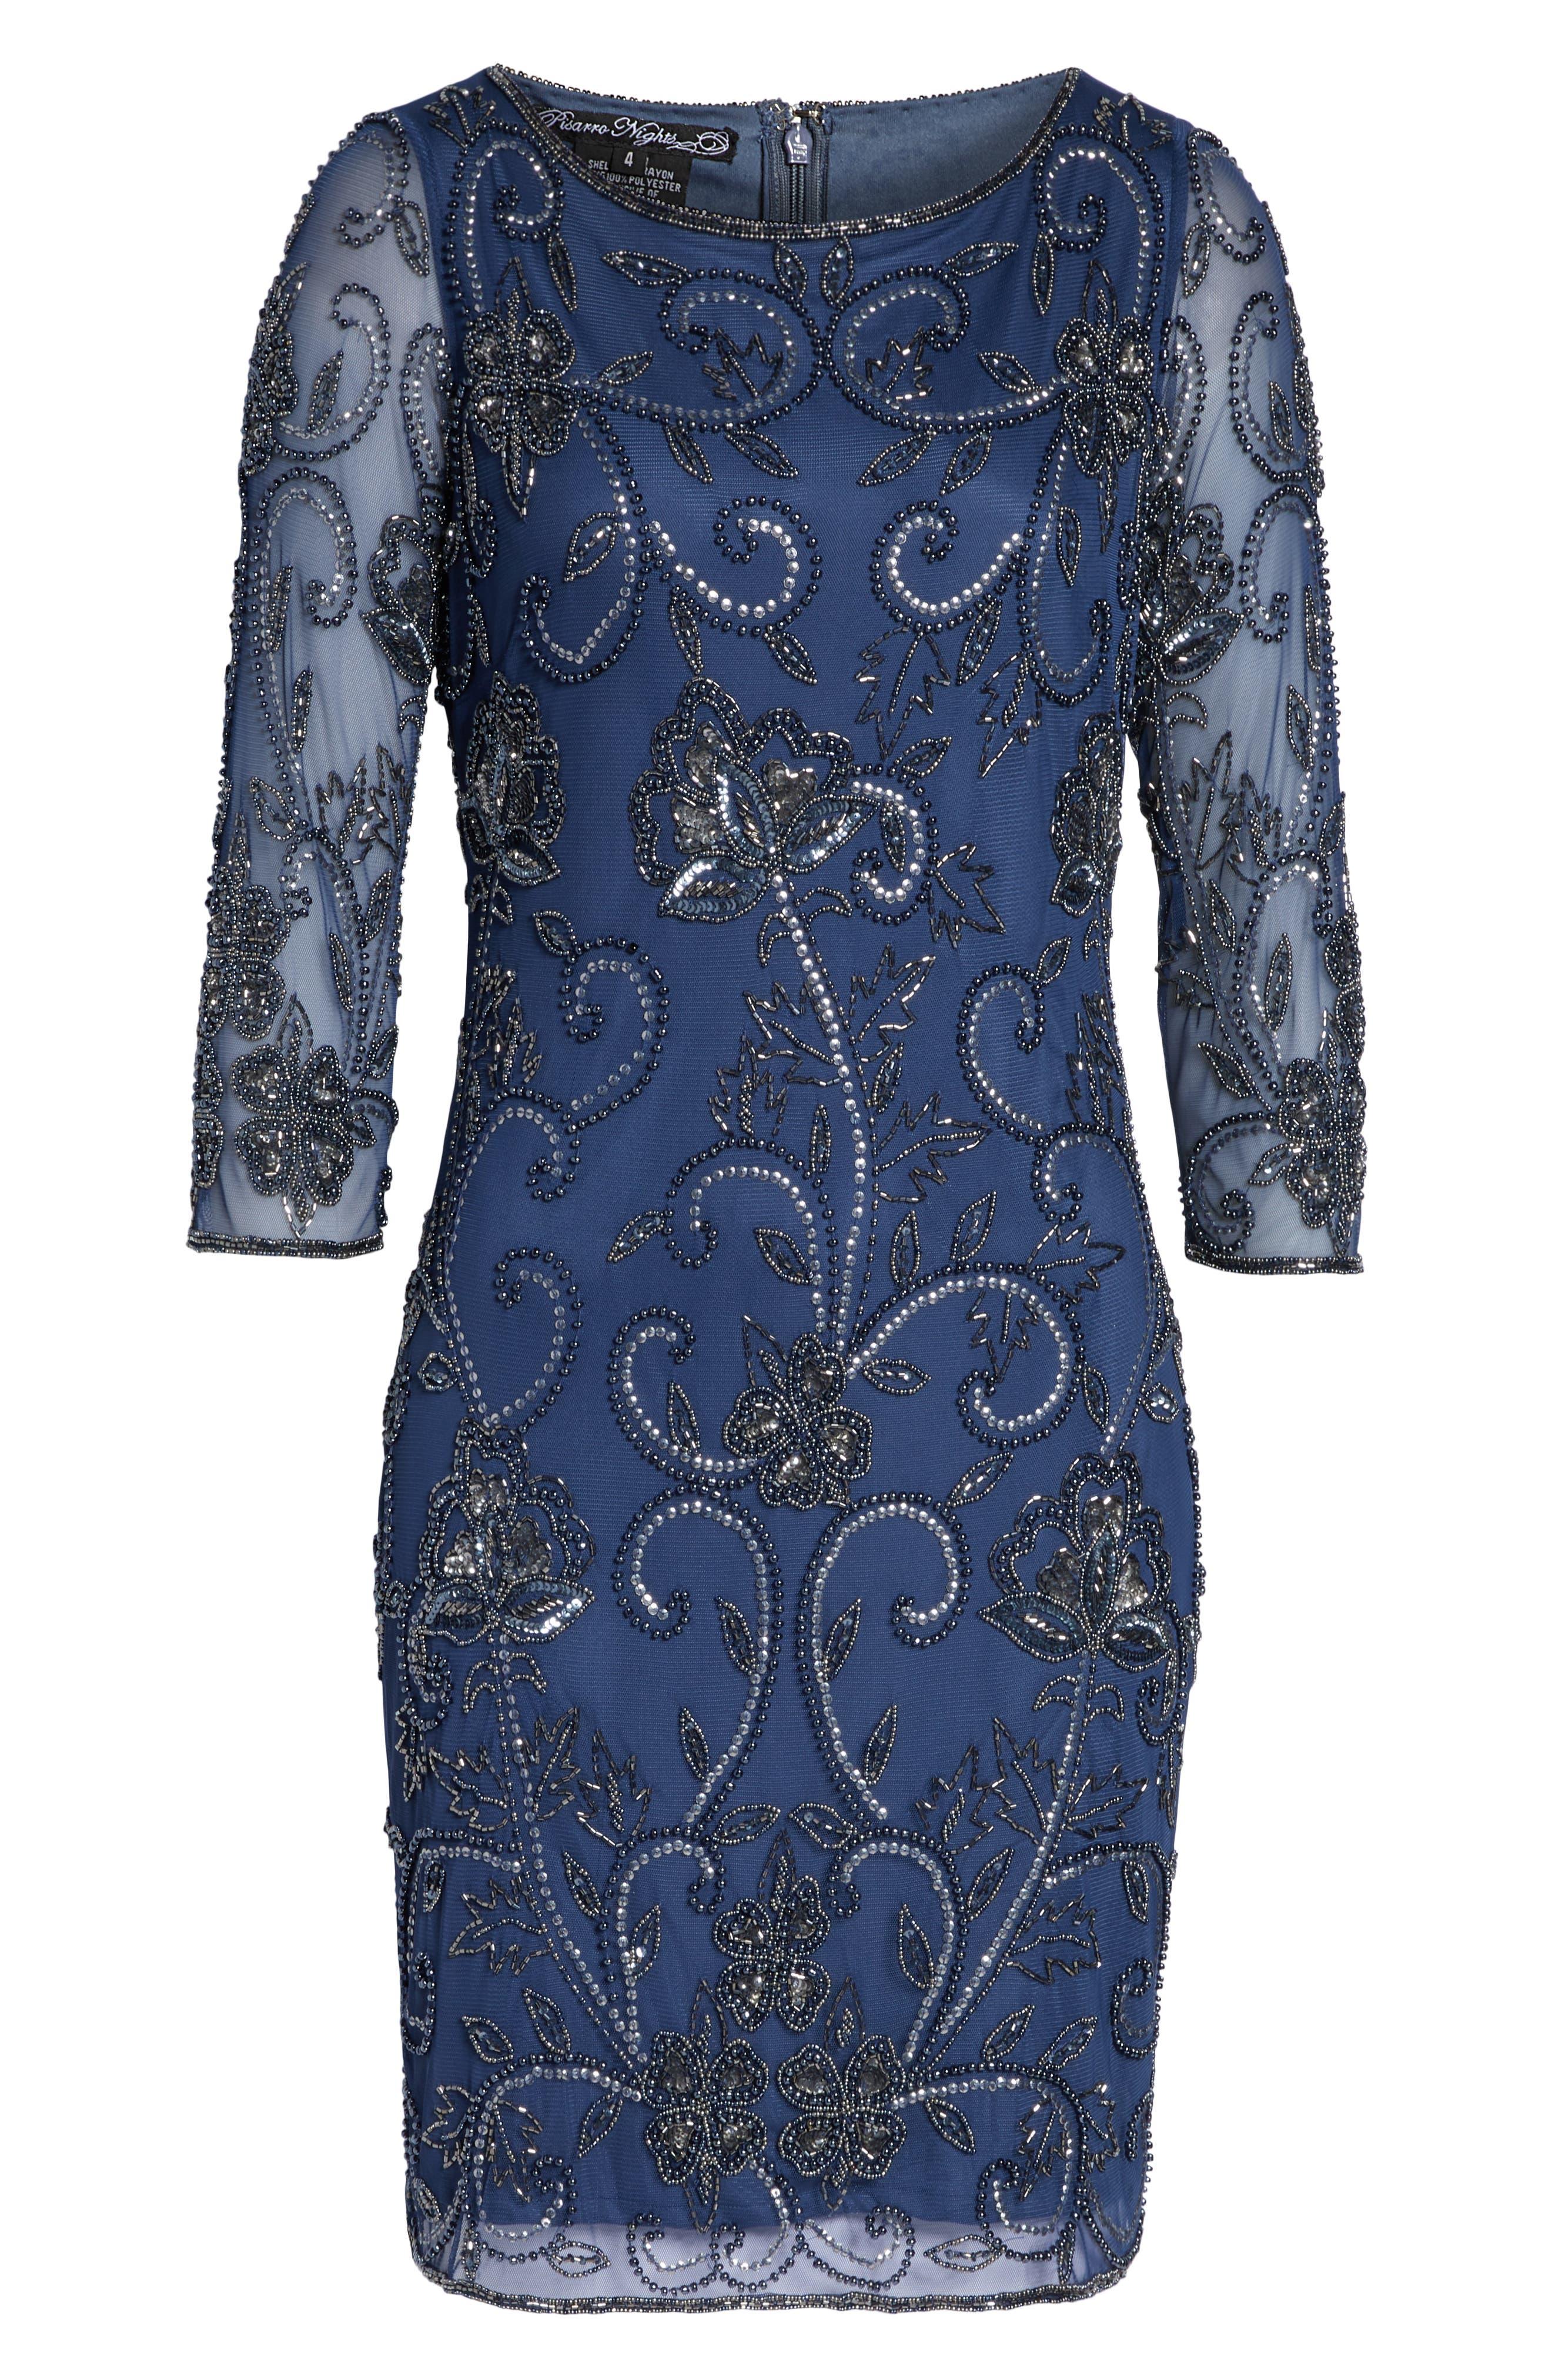 PISARRO NIGHTS, Embellished Mesh Sheath Dress, Alternate thumbnail 7, color, BLUE